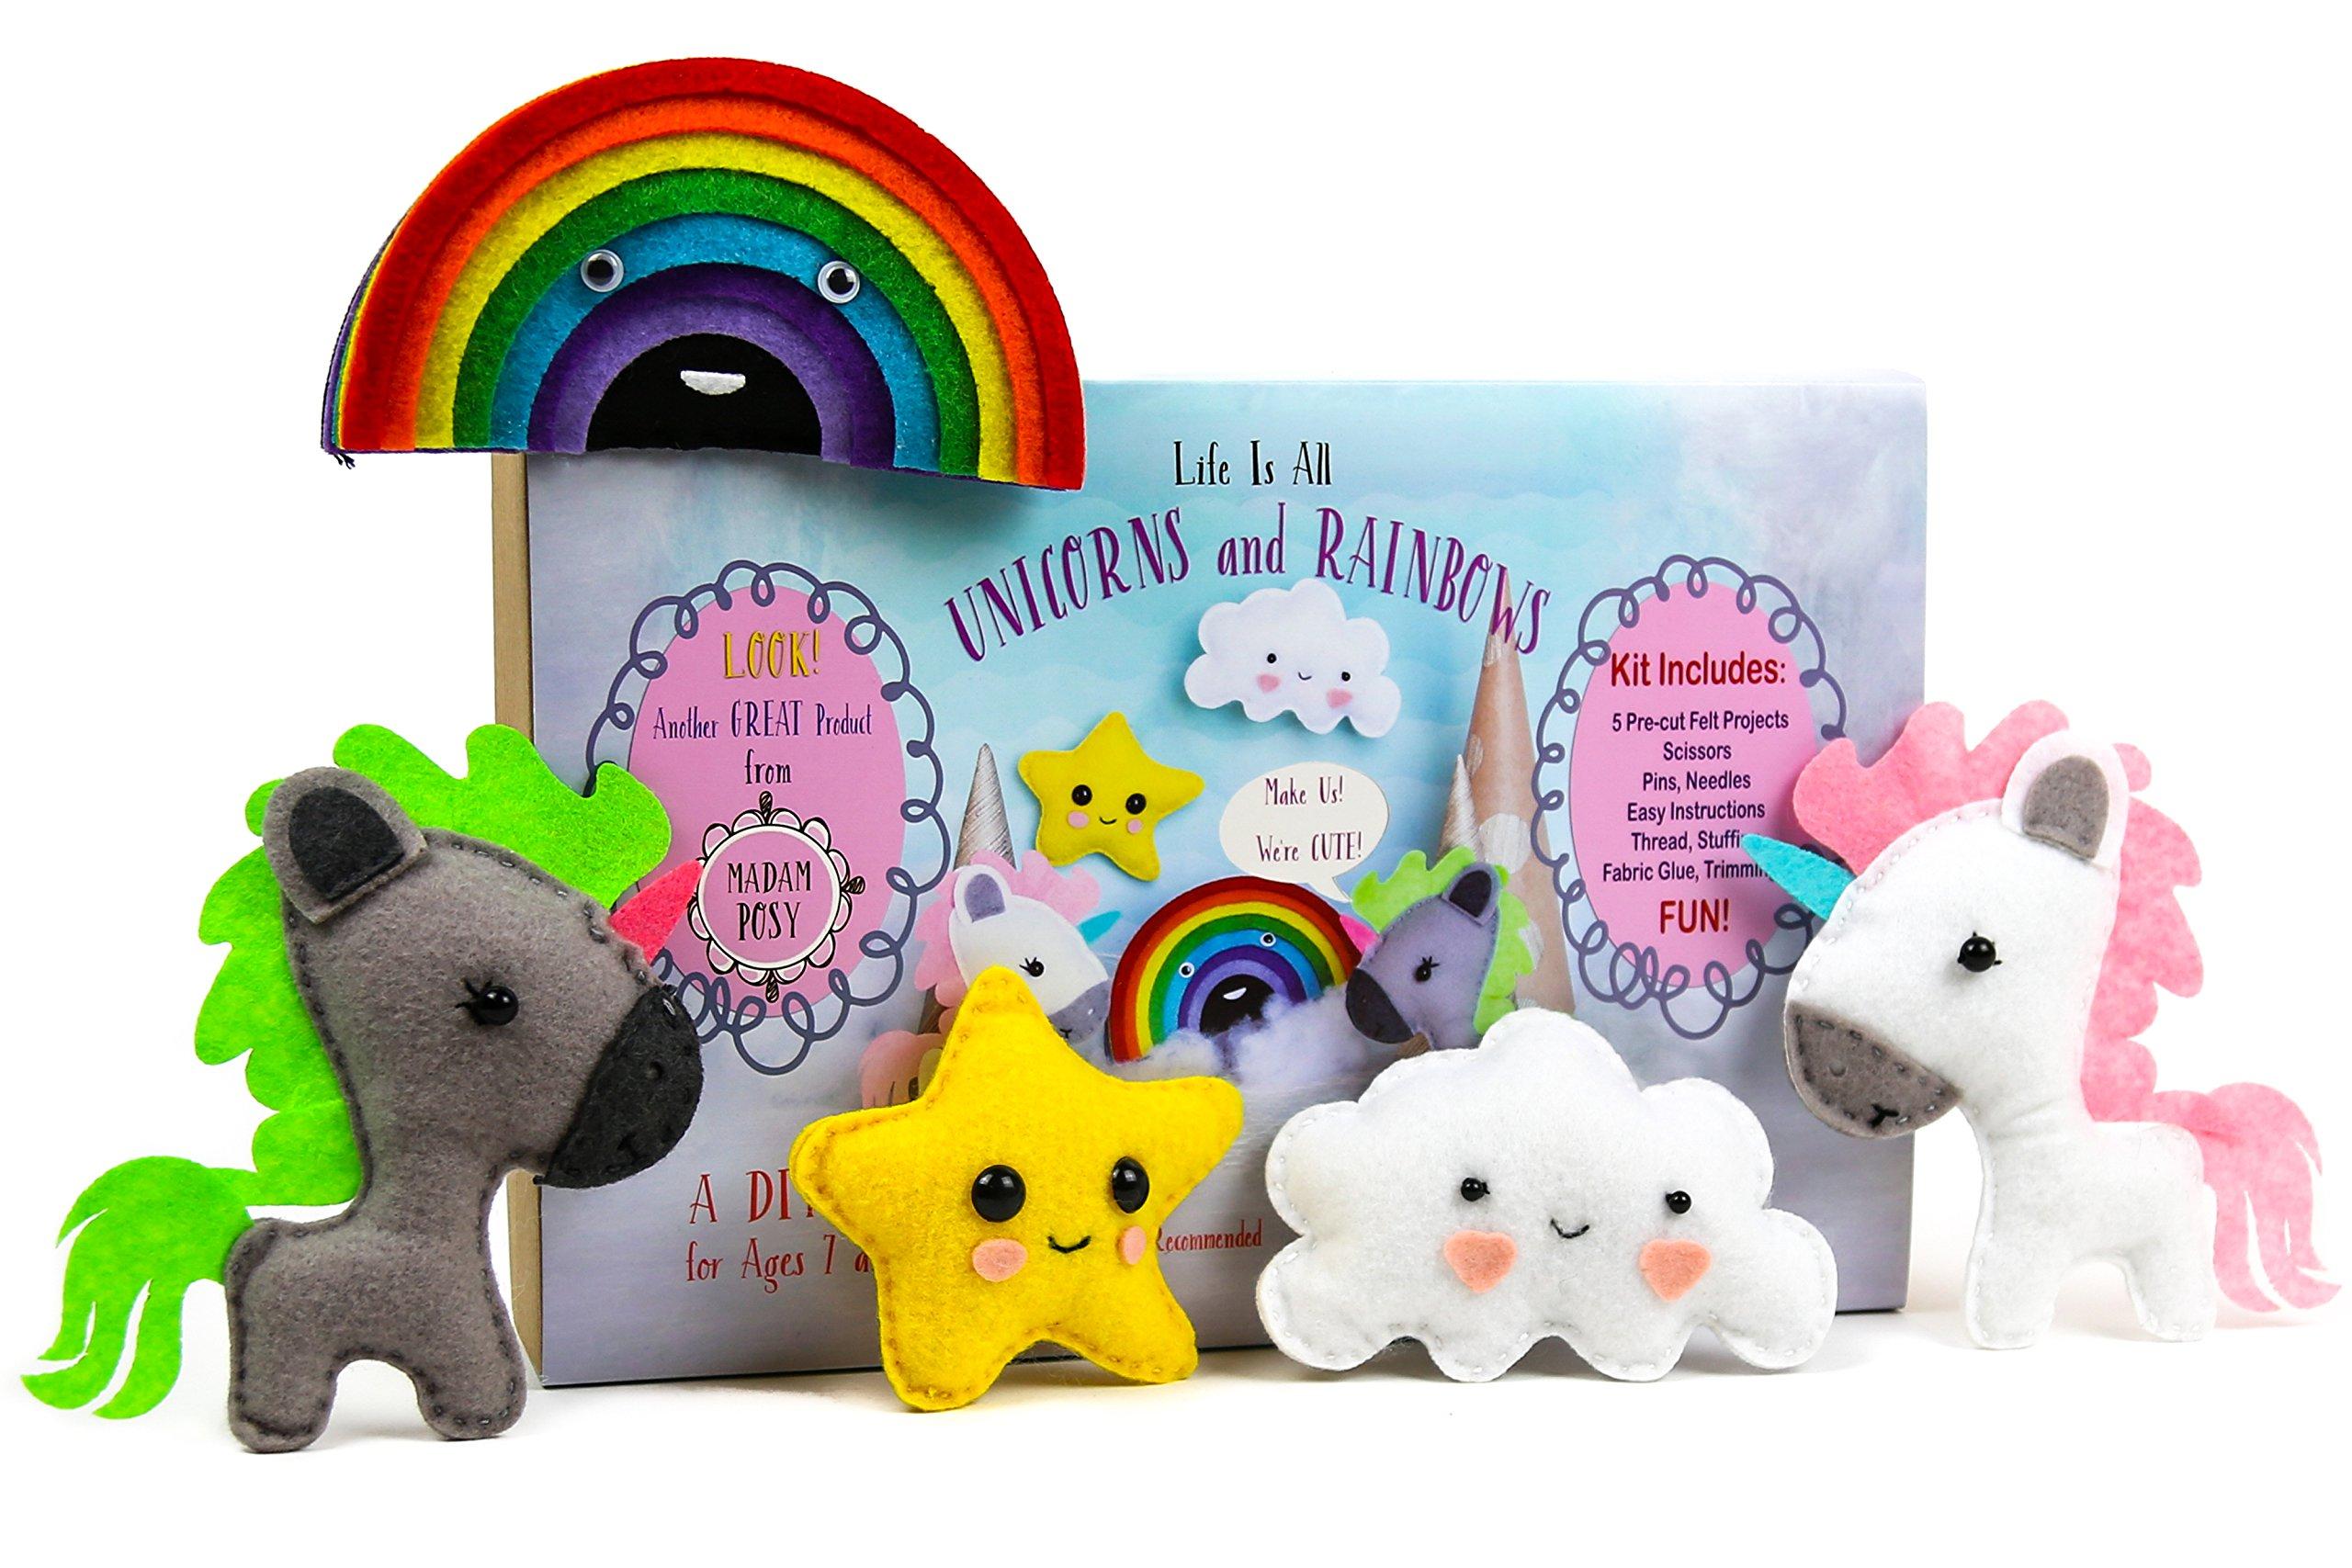 Madam Posy Design Rainbows Unicorns Stuffed Animal Sewing Crafts Kit Girls: Unicorn DIY Stuffed Animal Sewing Craft Kit kids Age 7-12